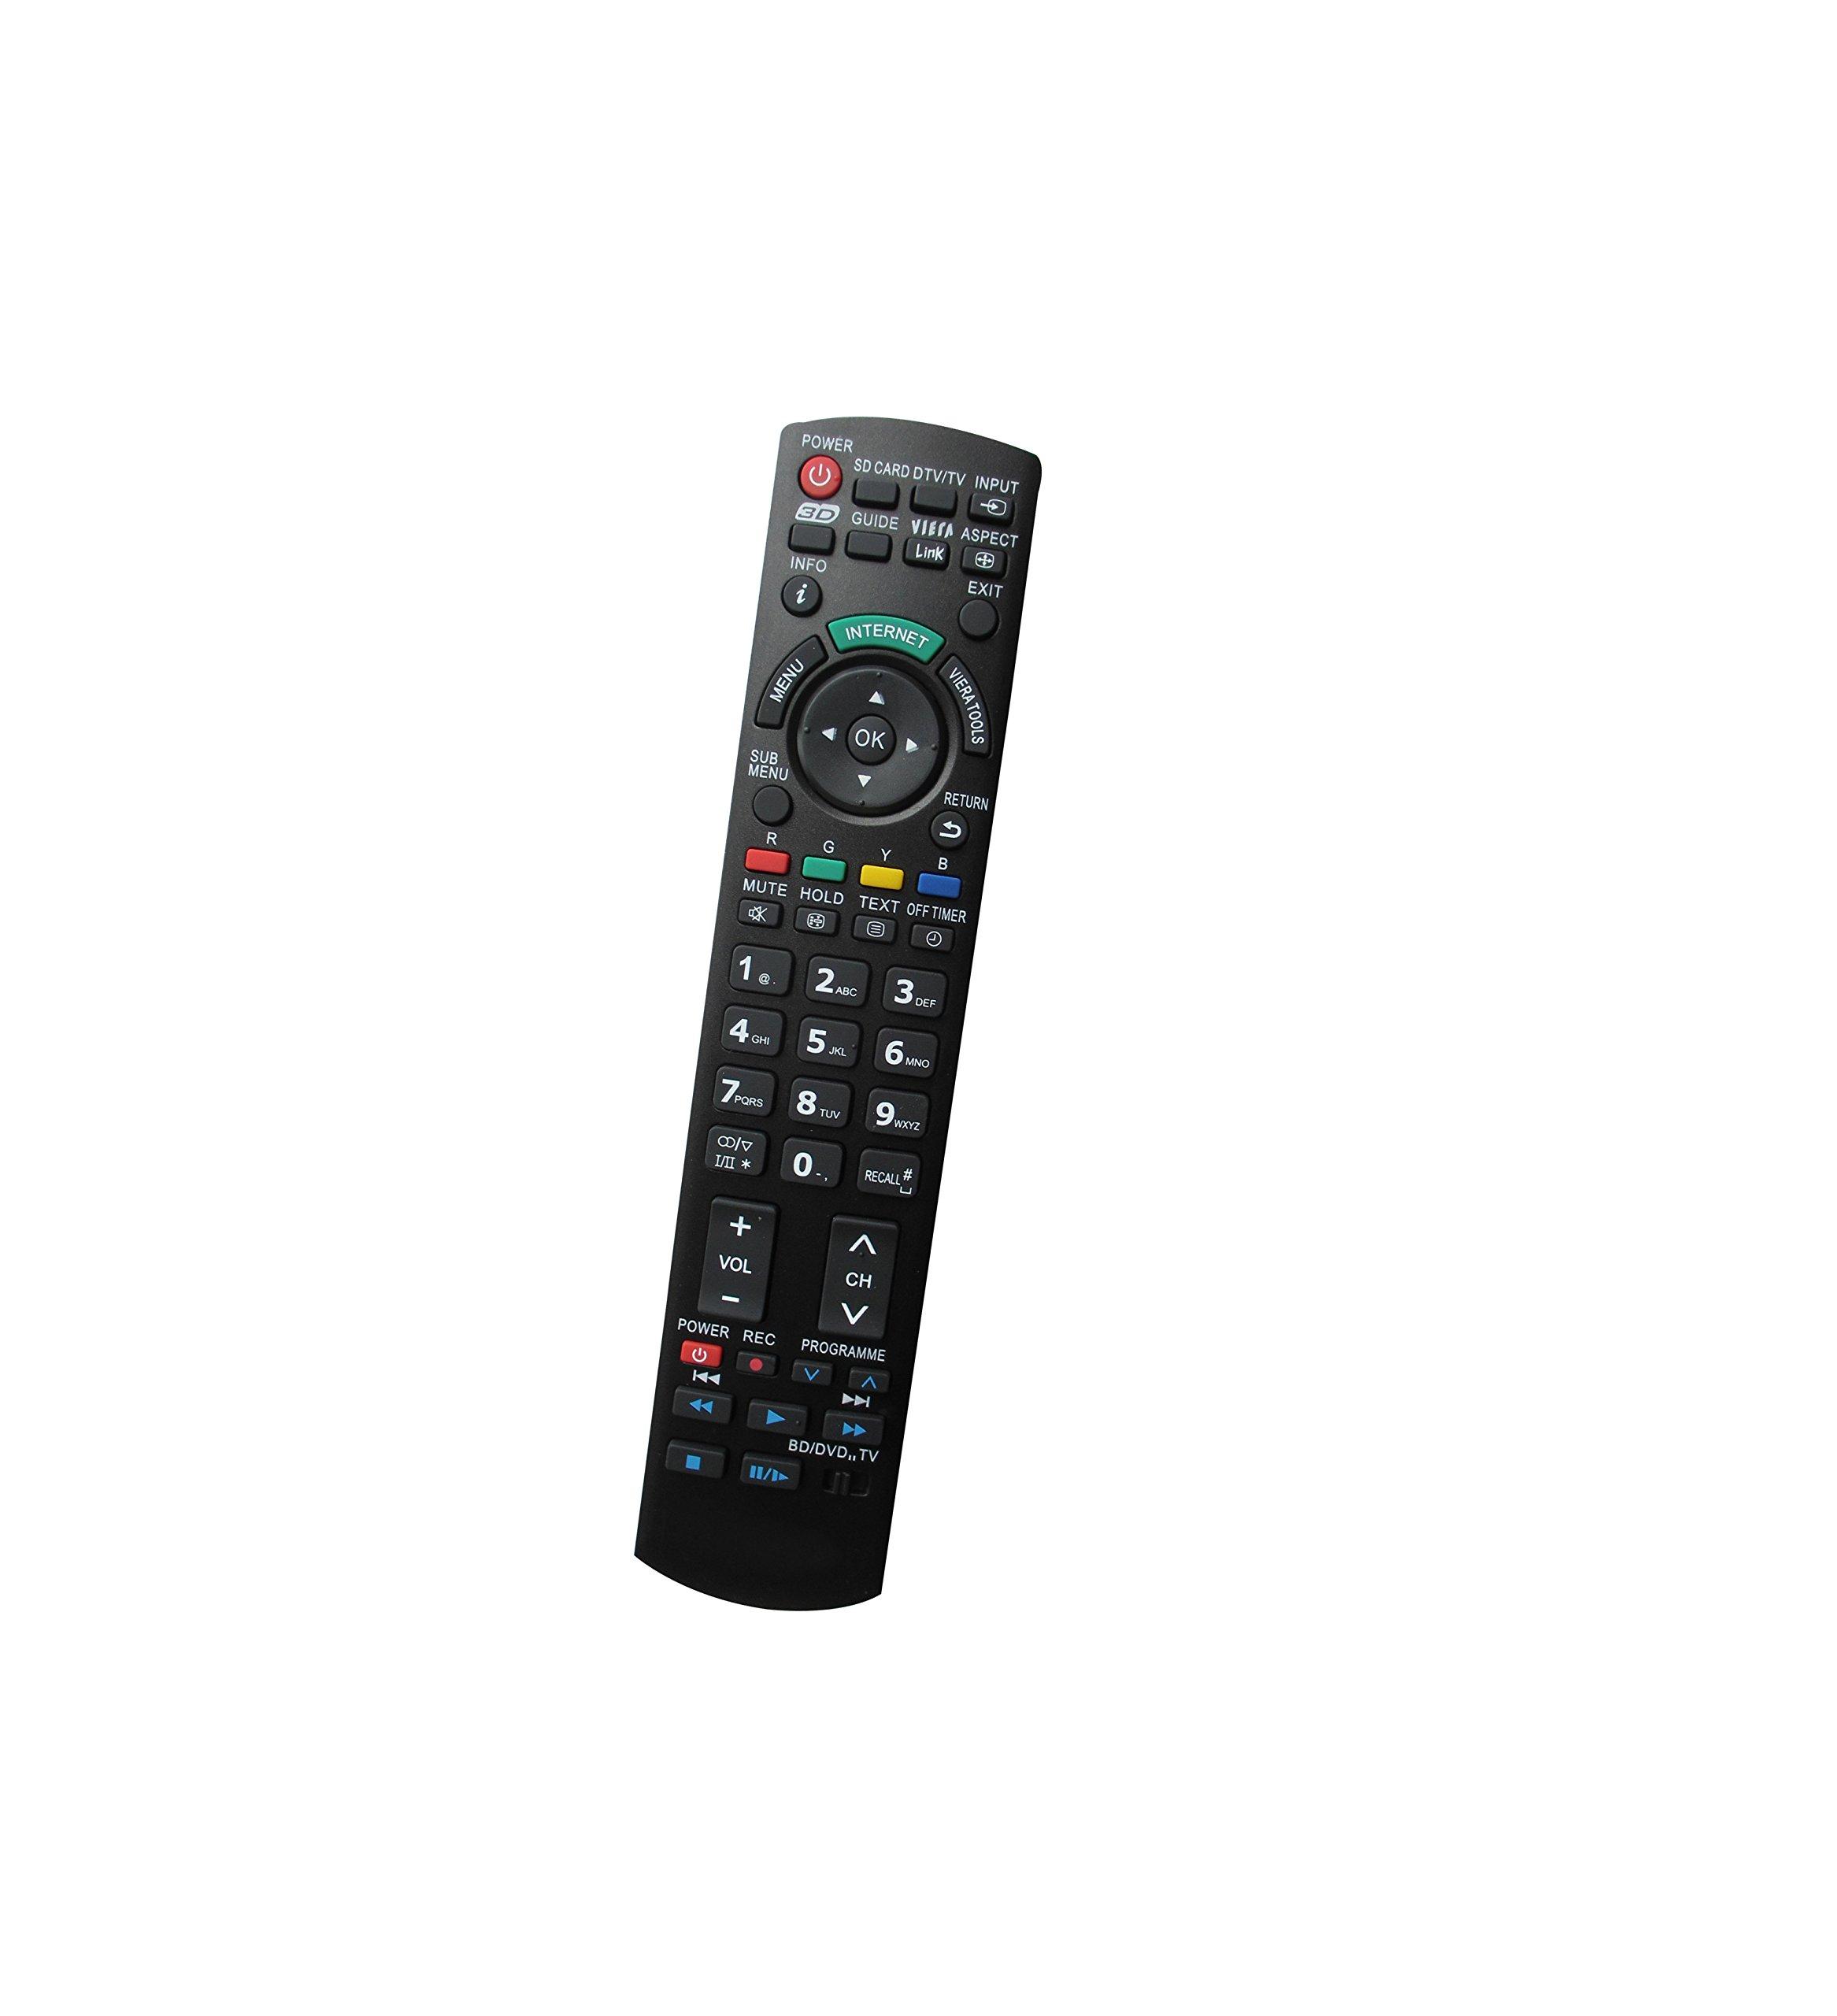 Universal Replacement Remote Control Fit For Panasonic TC-22LH1 TC-22LH30 TC-23LX50 TH-42LRH50U TH-47LFV5U Plasma LCD LED HDTV 3D Viera TV